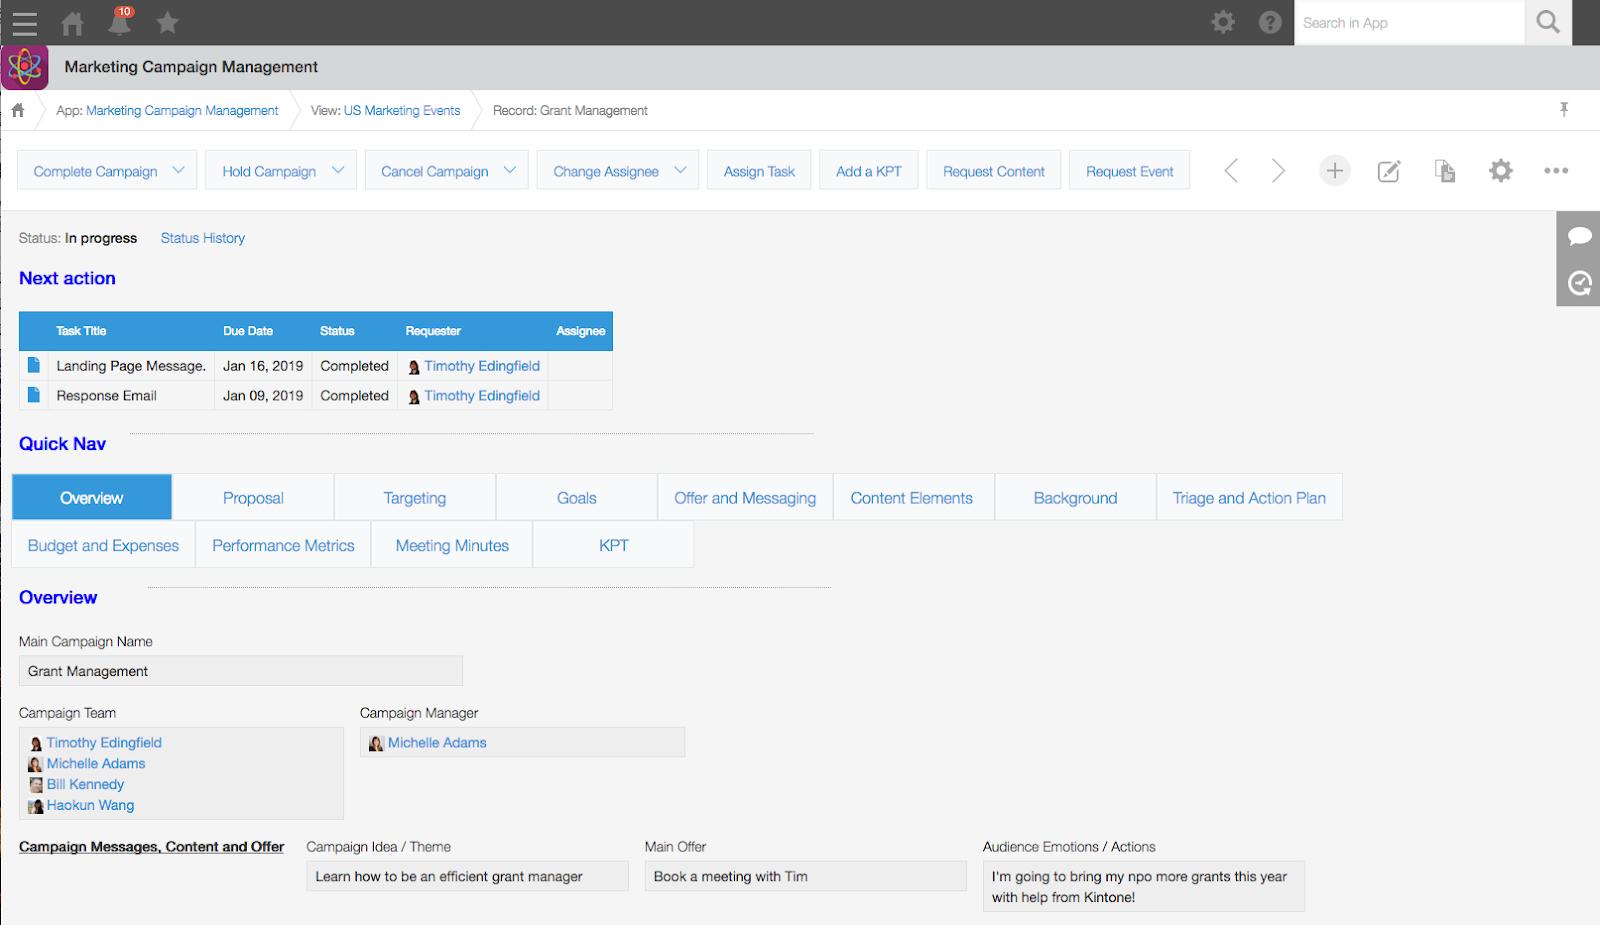 Kintone  Campaign Management App - Grant Management Campaign Record (Overview Tab)